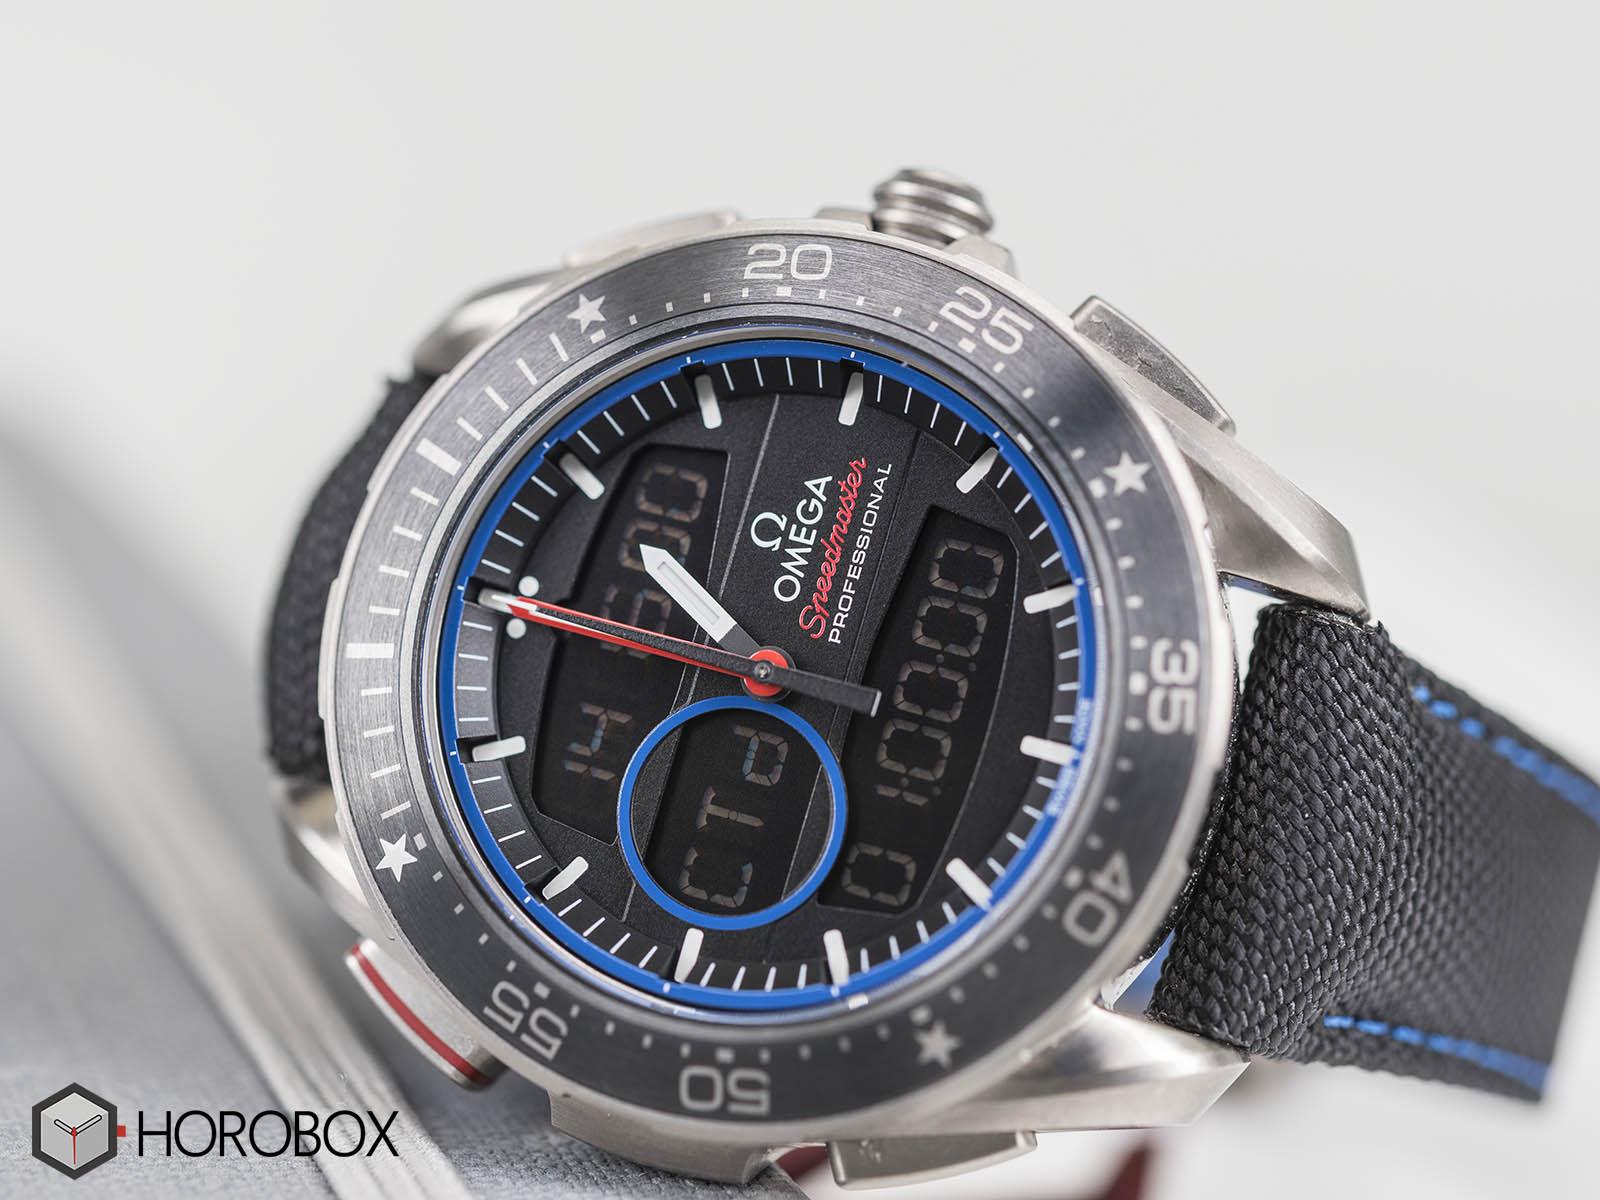 omega-speedmaster-x-33-regatta-chronograph-318-92-45-79-01-001-8-.jpg